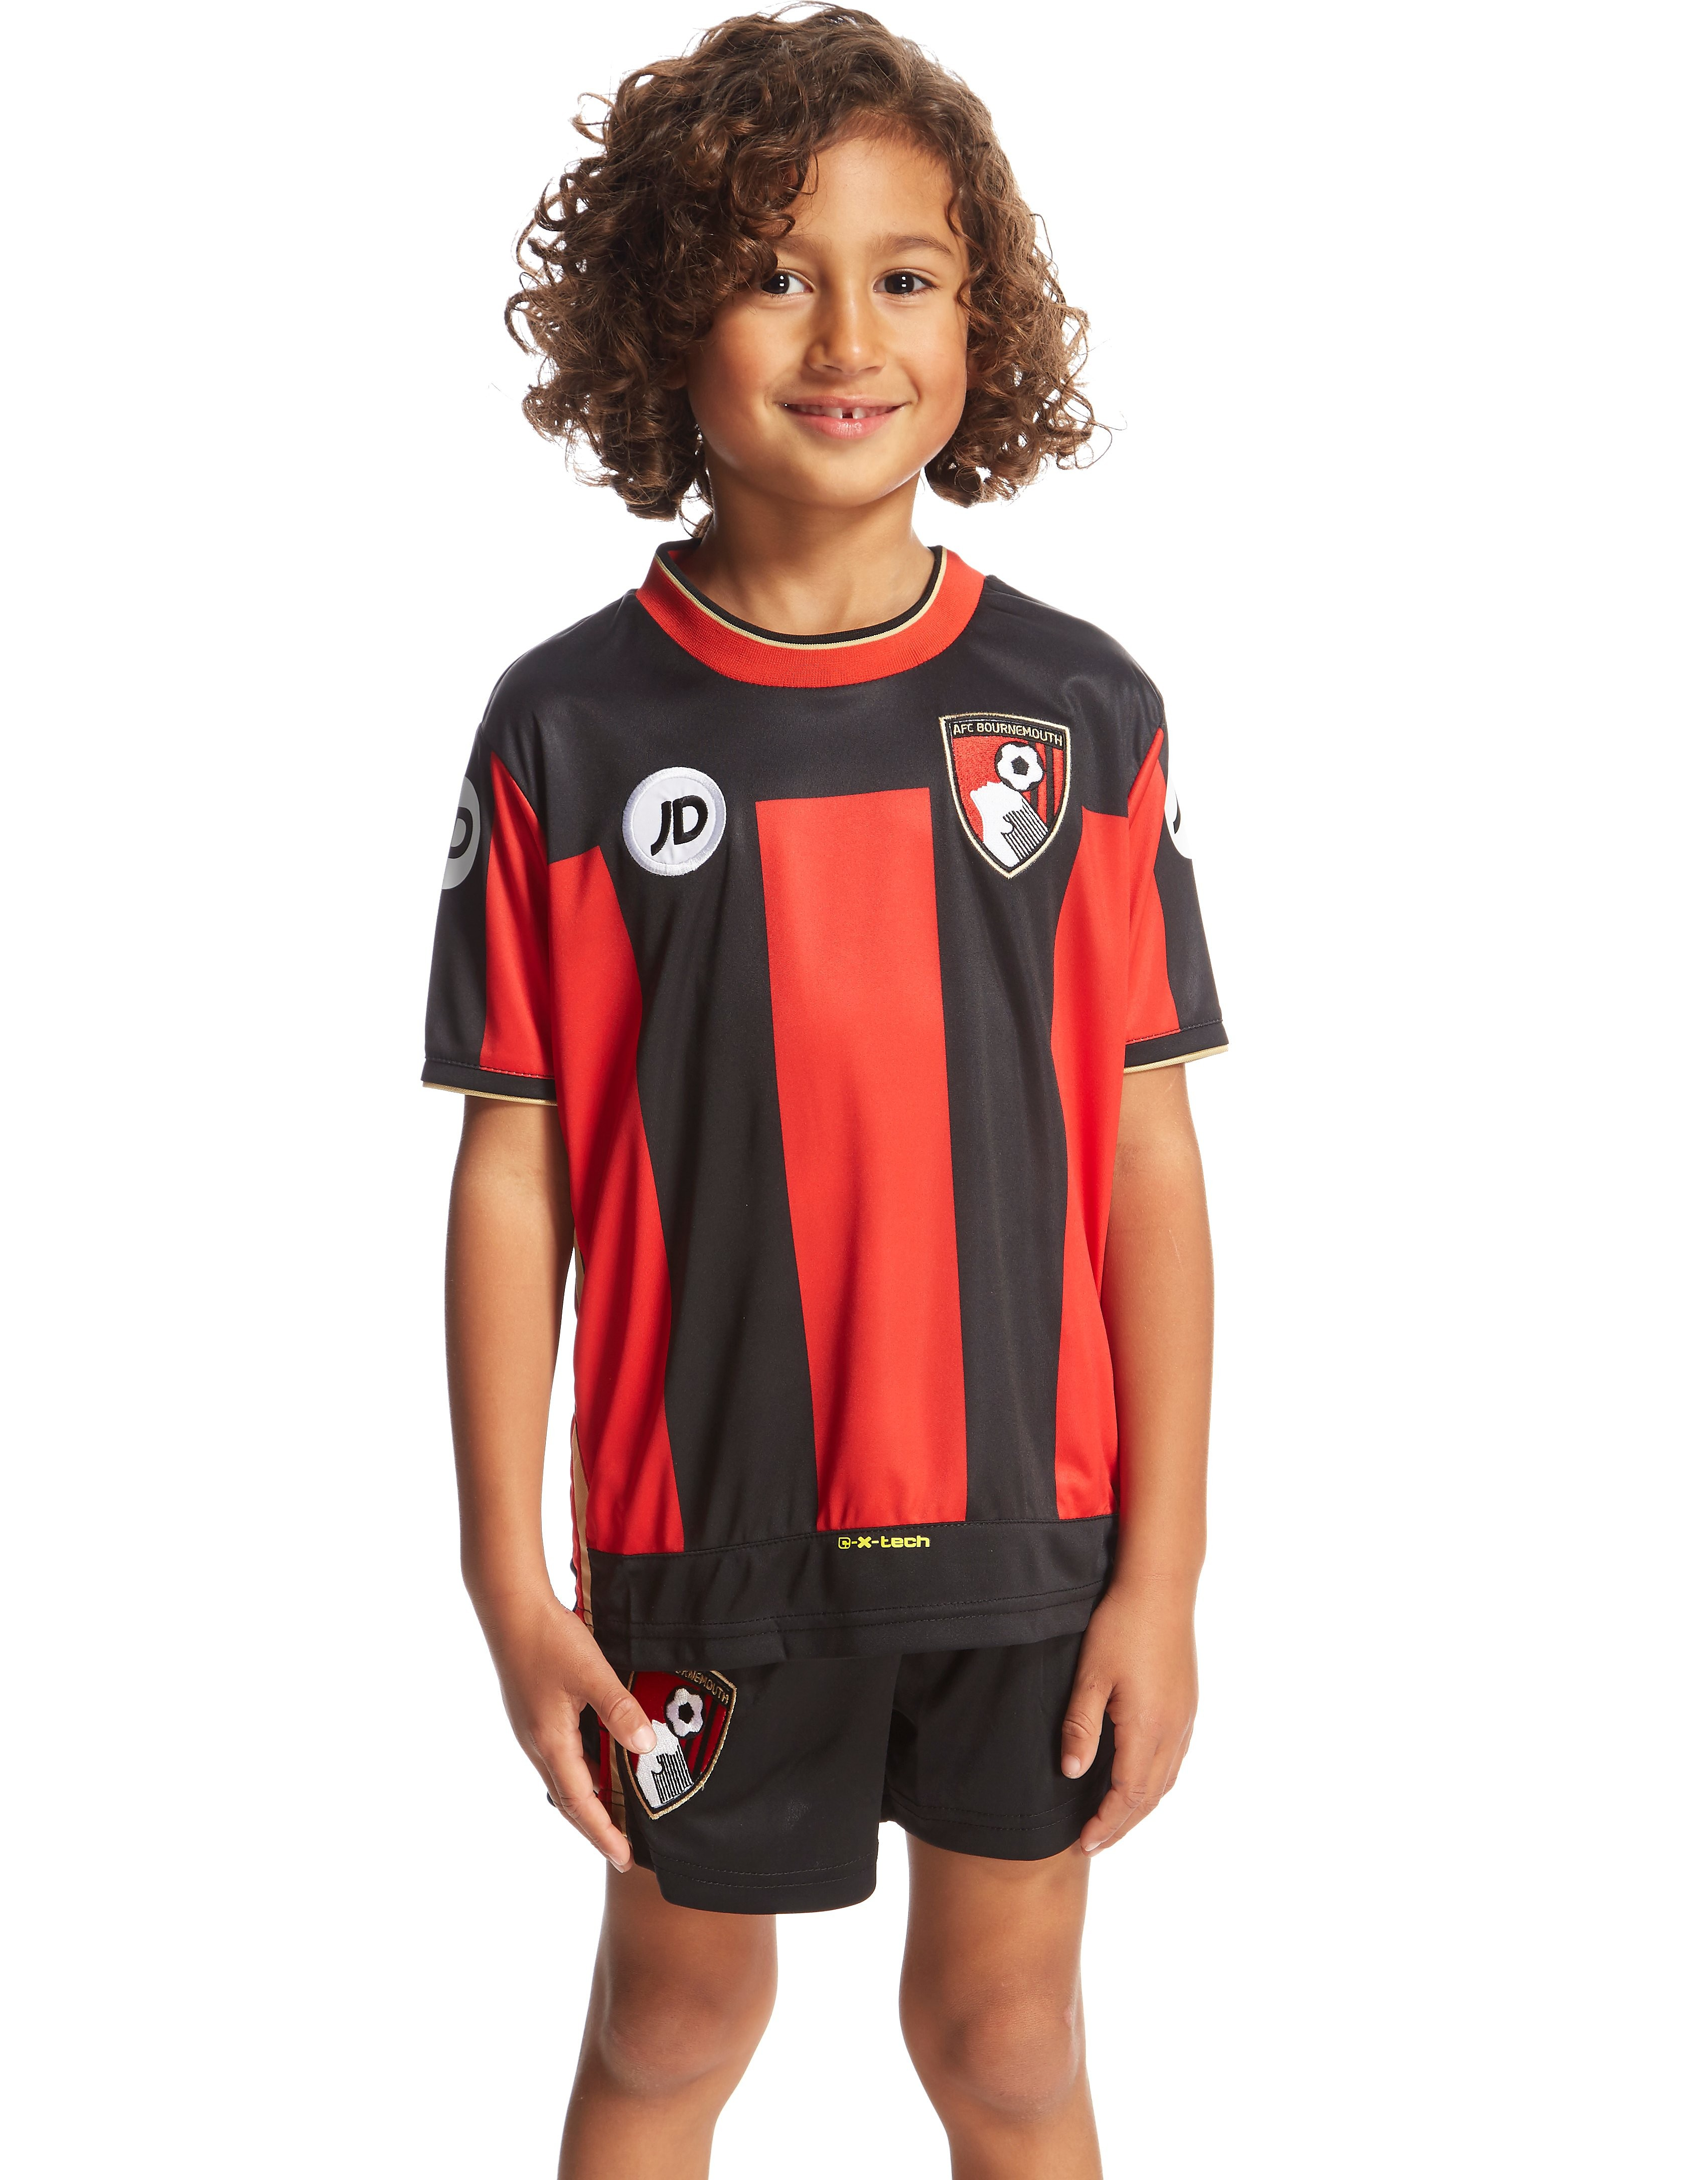 JD AFC Bournemouth Home 2015/16 Kit Children